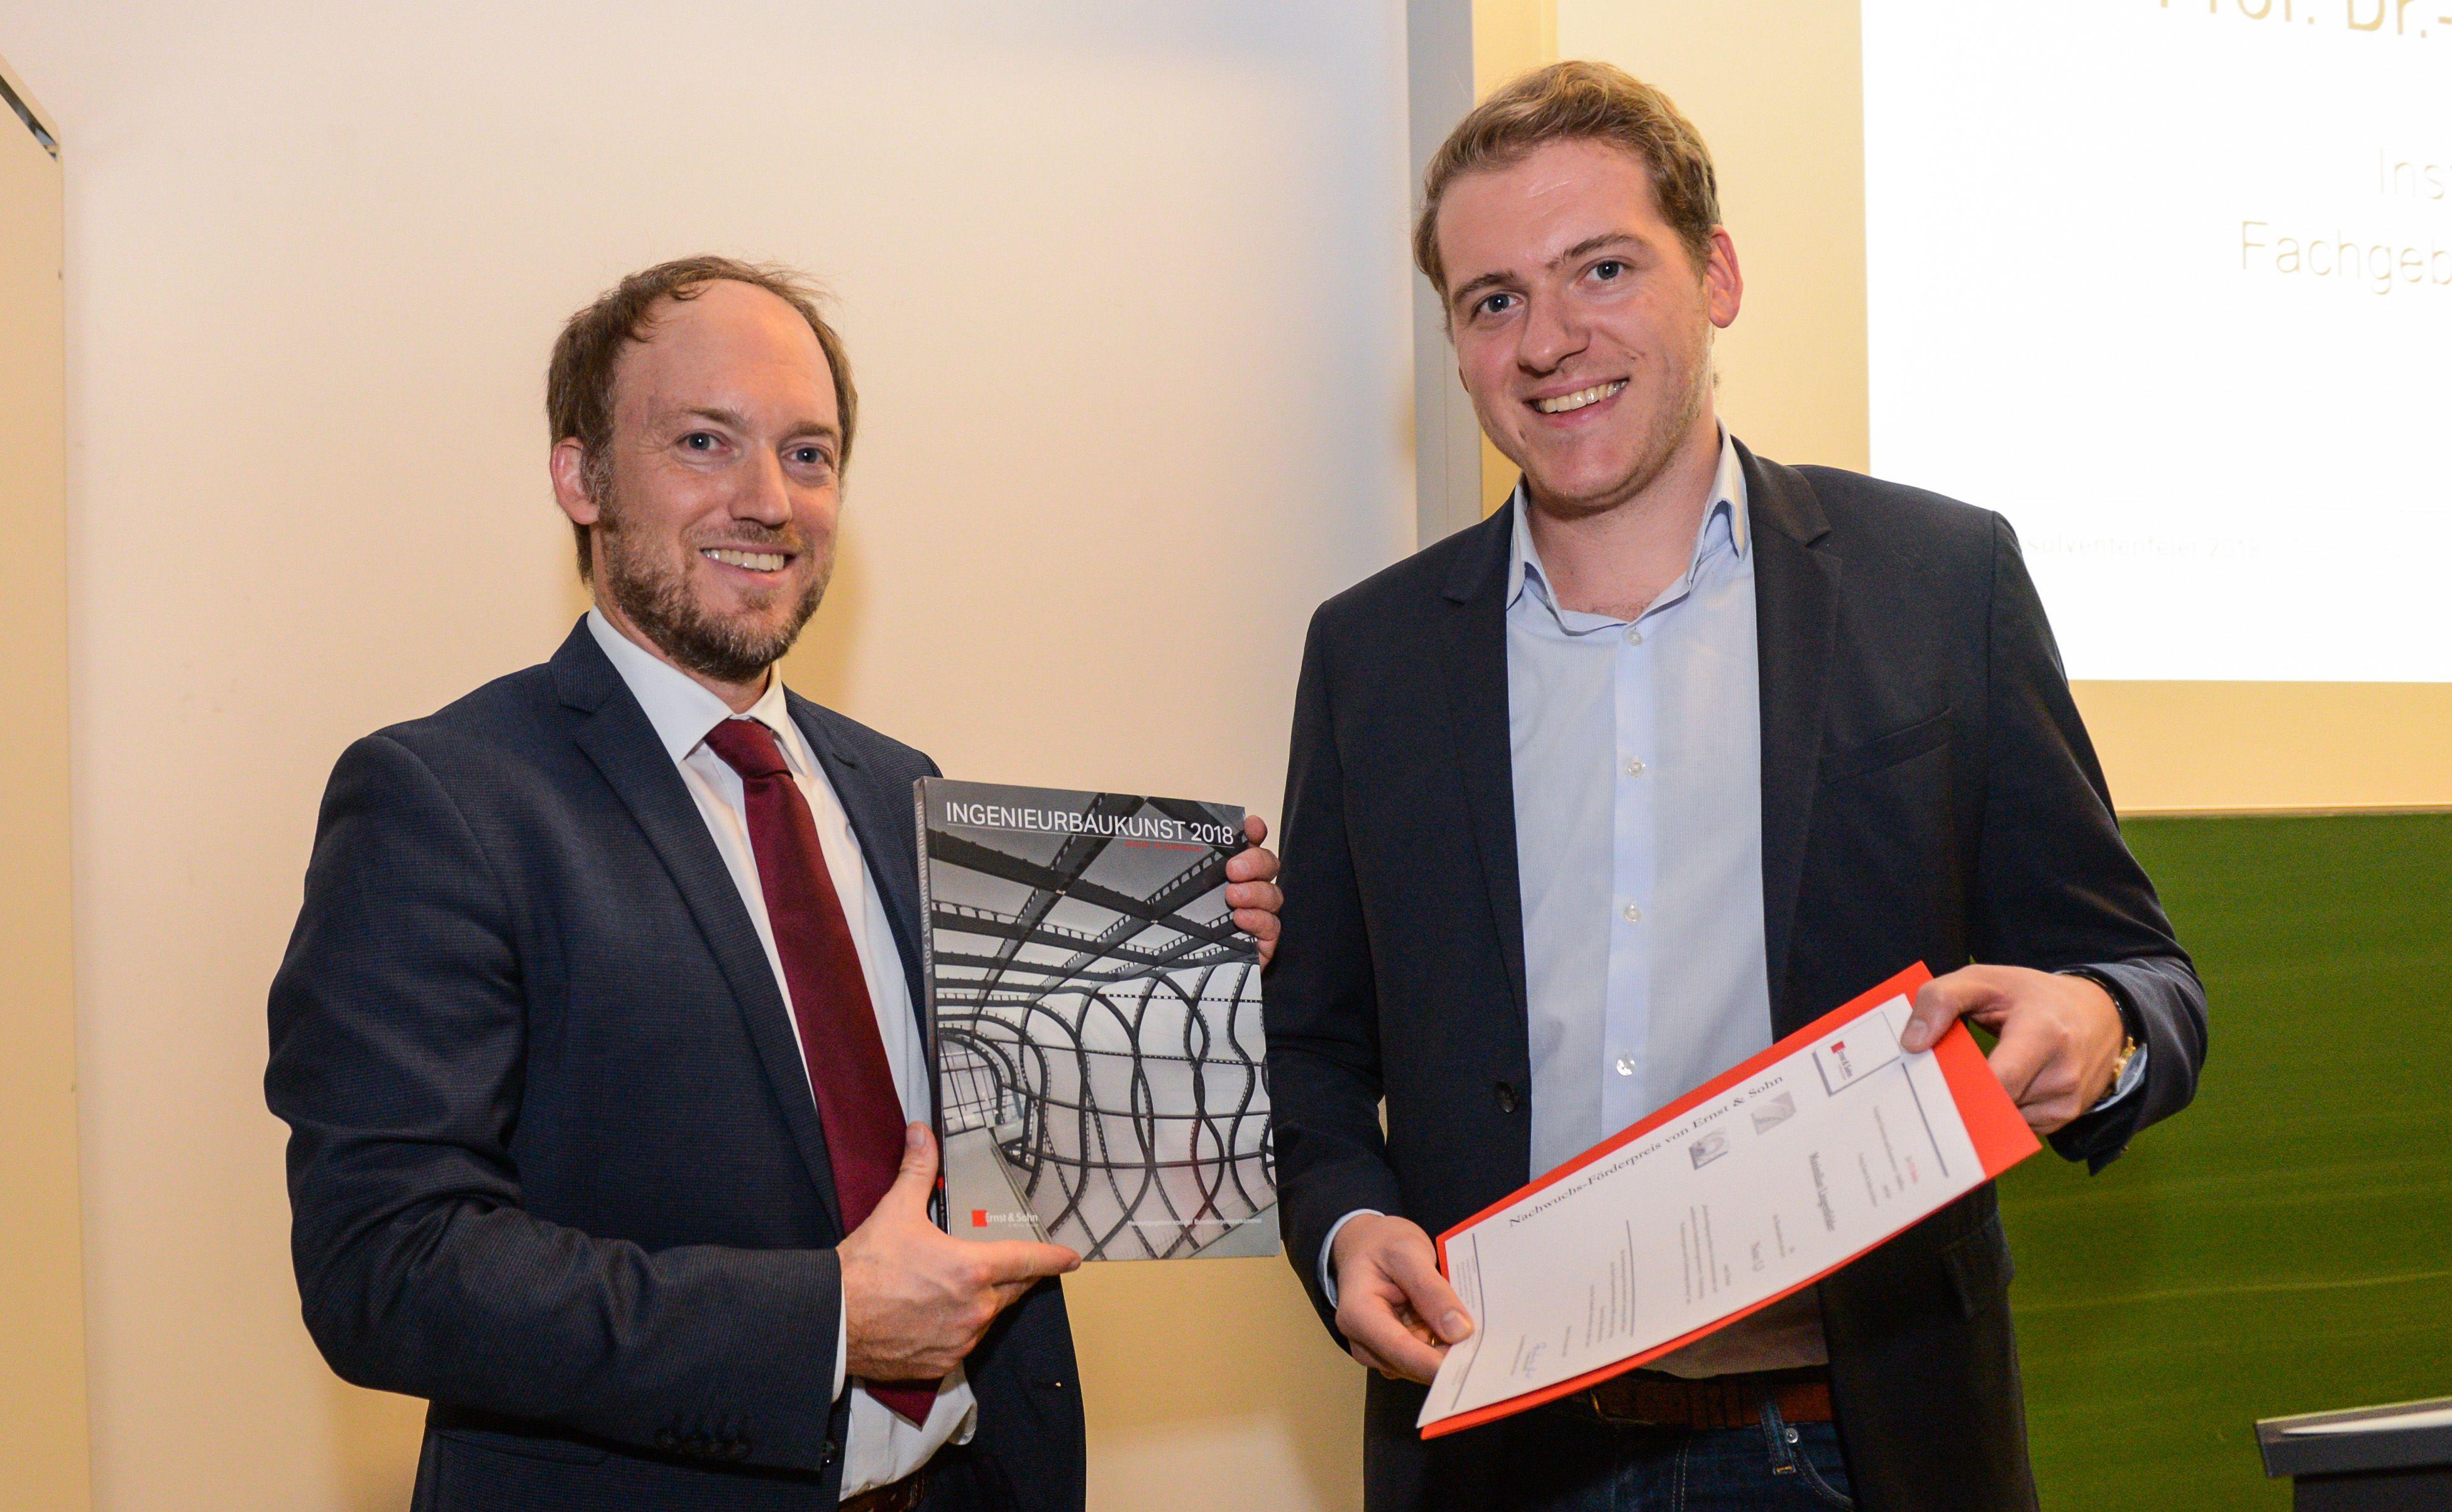 Überreichung des Ernst & Sohn-Preises durch Herrn Prof. Sundermeier an Herrn Maximilian Lingenfelder